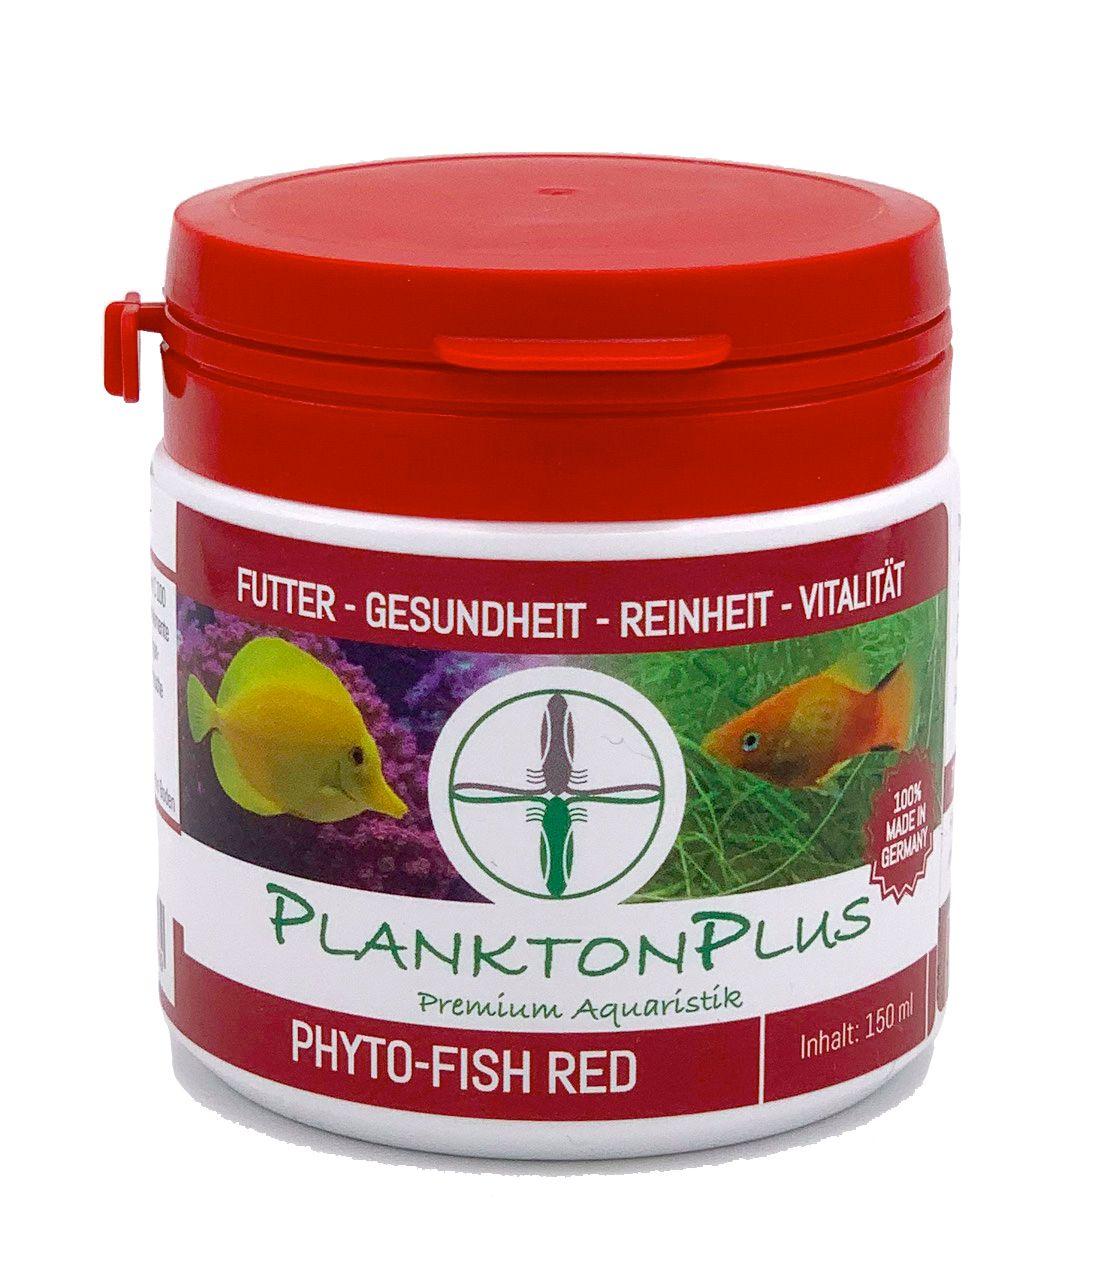 PlanktonPlus Phyto-Fish Red L 250ml